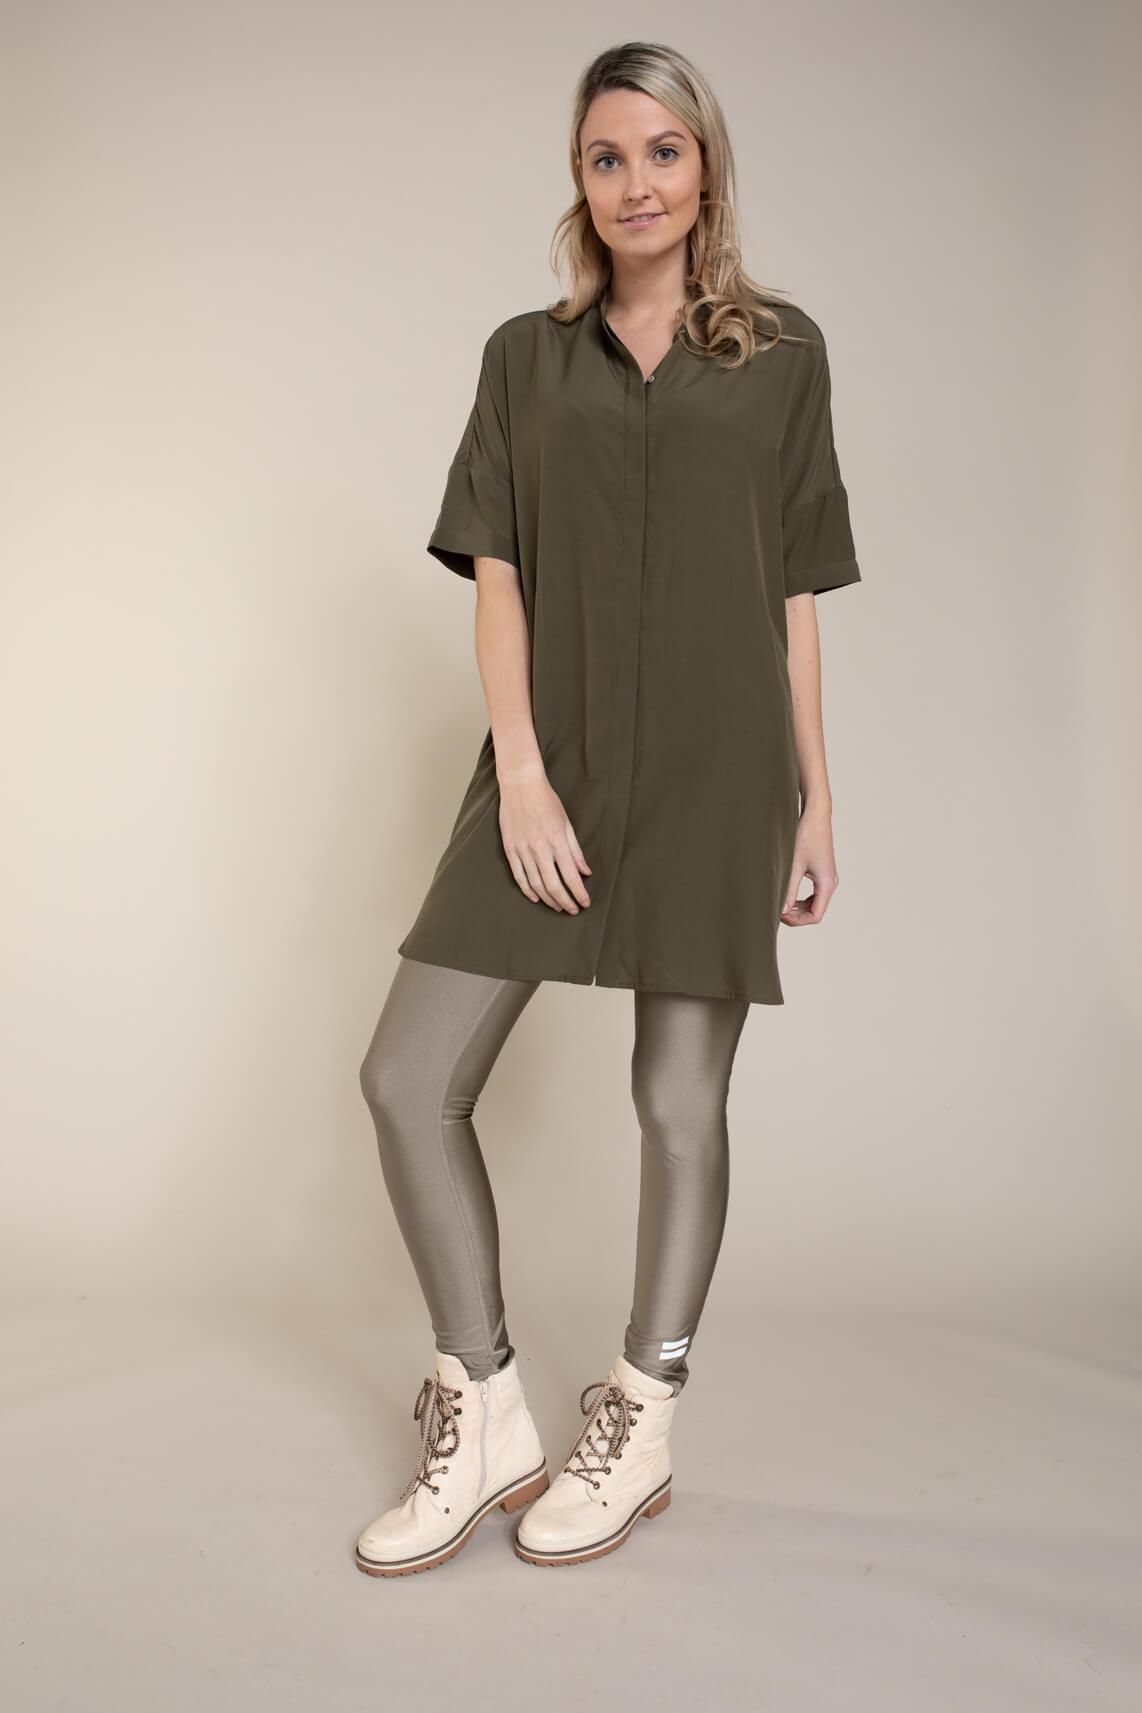 Co Couture Dames Sunrise tuniek shirt groen